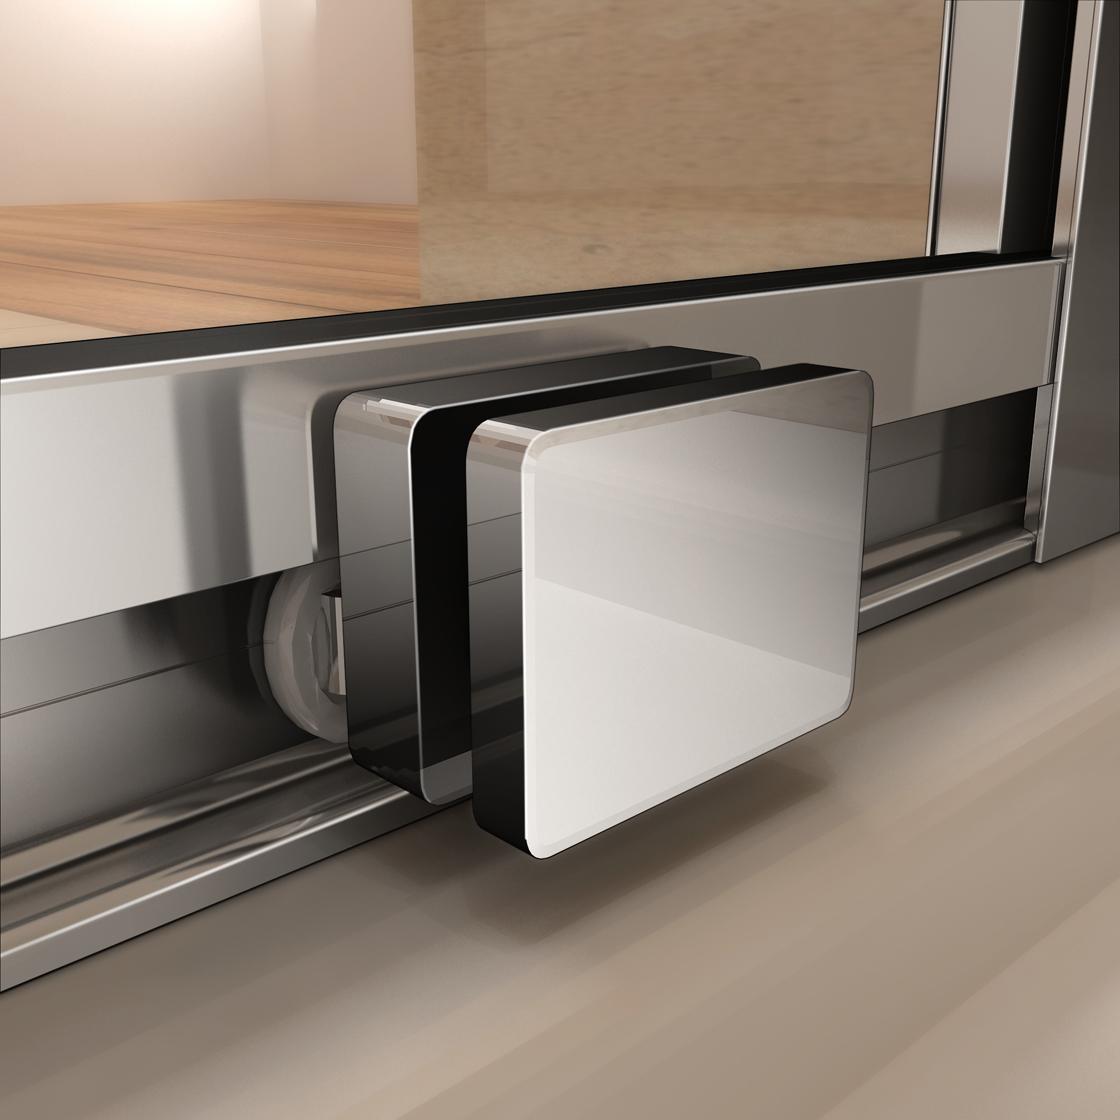 Mamparas de ducha 6mm cristal templado puerta corredera de - Quitar cristal templado ...